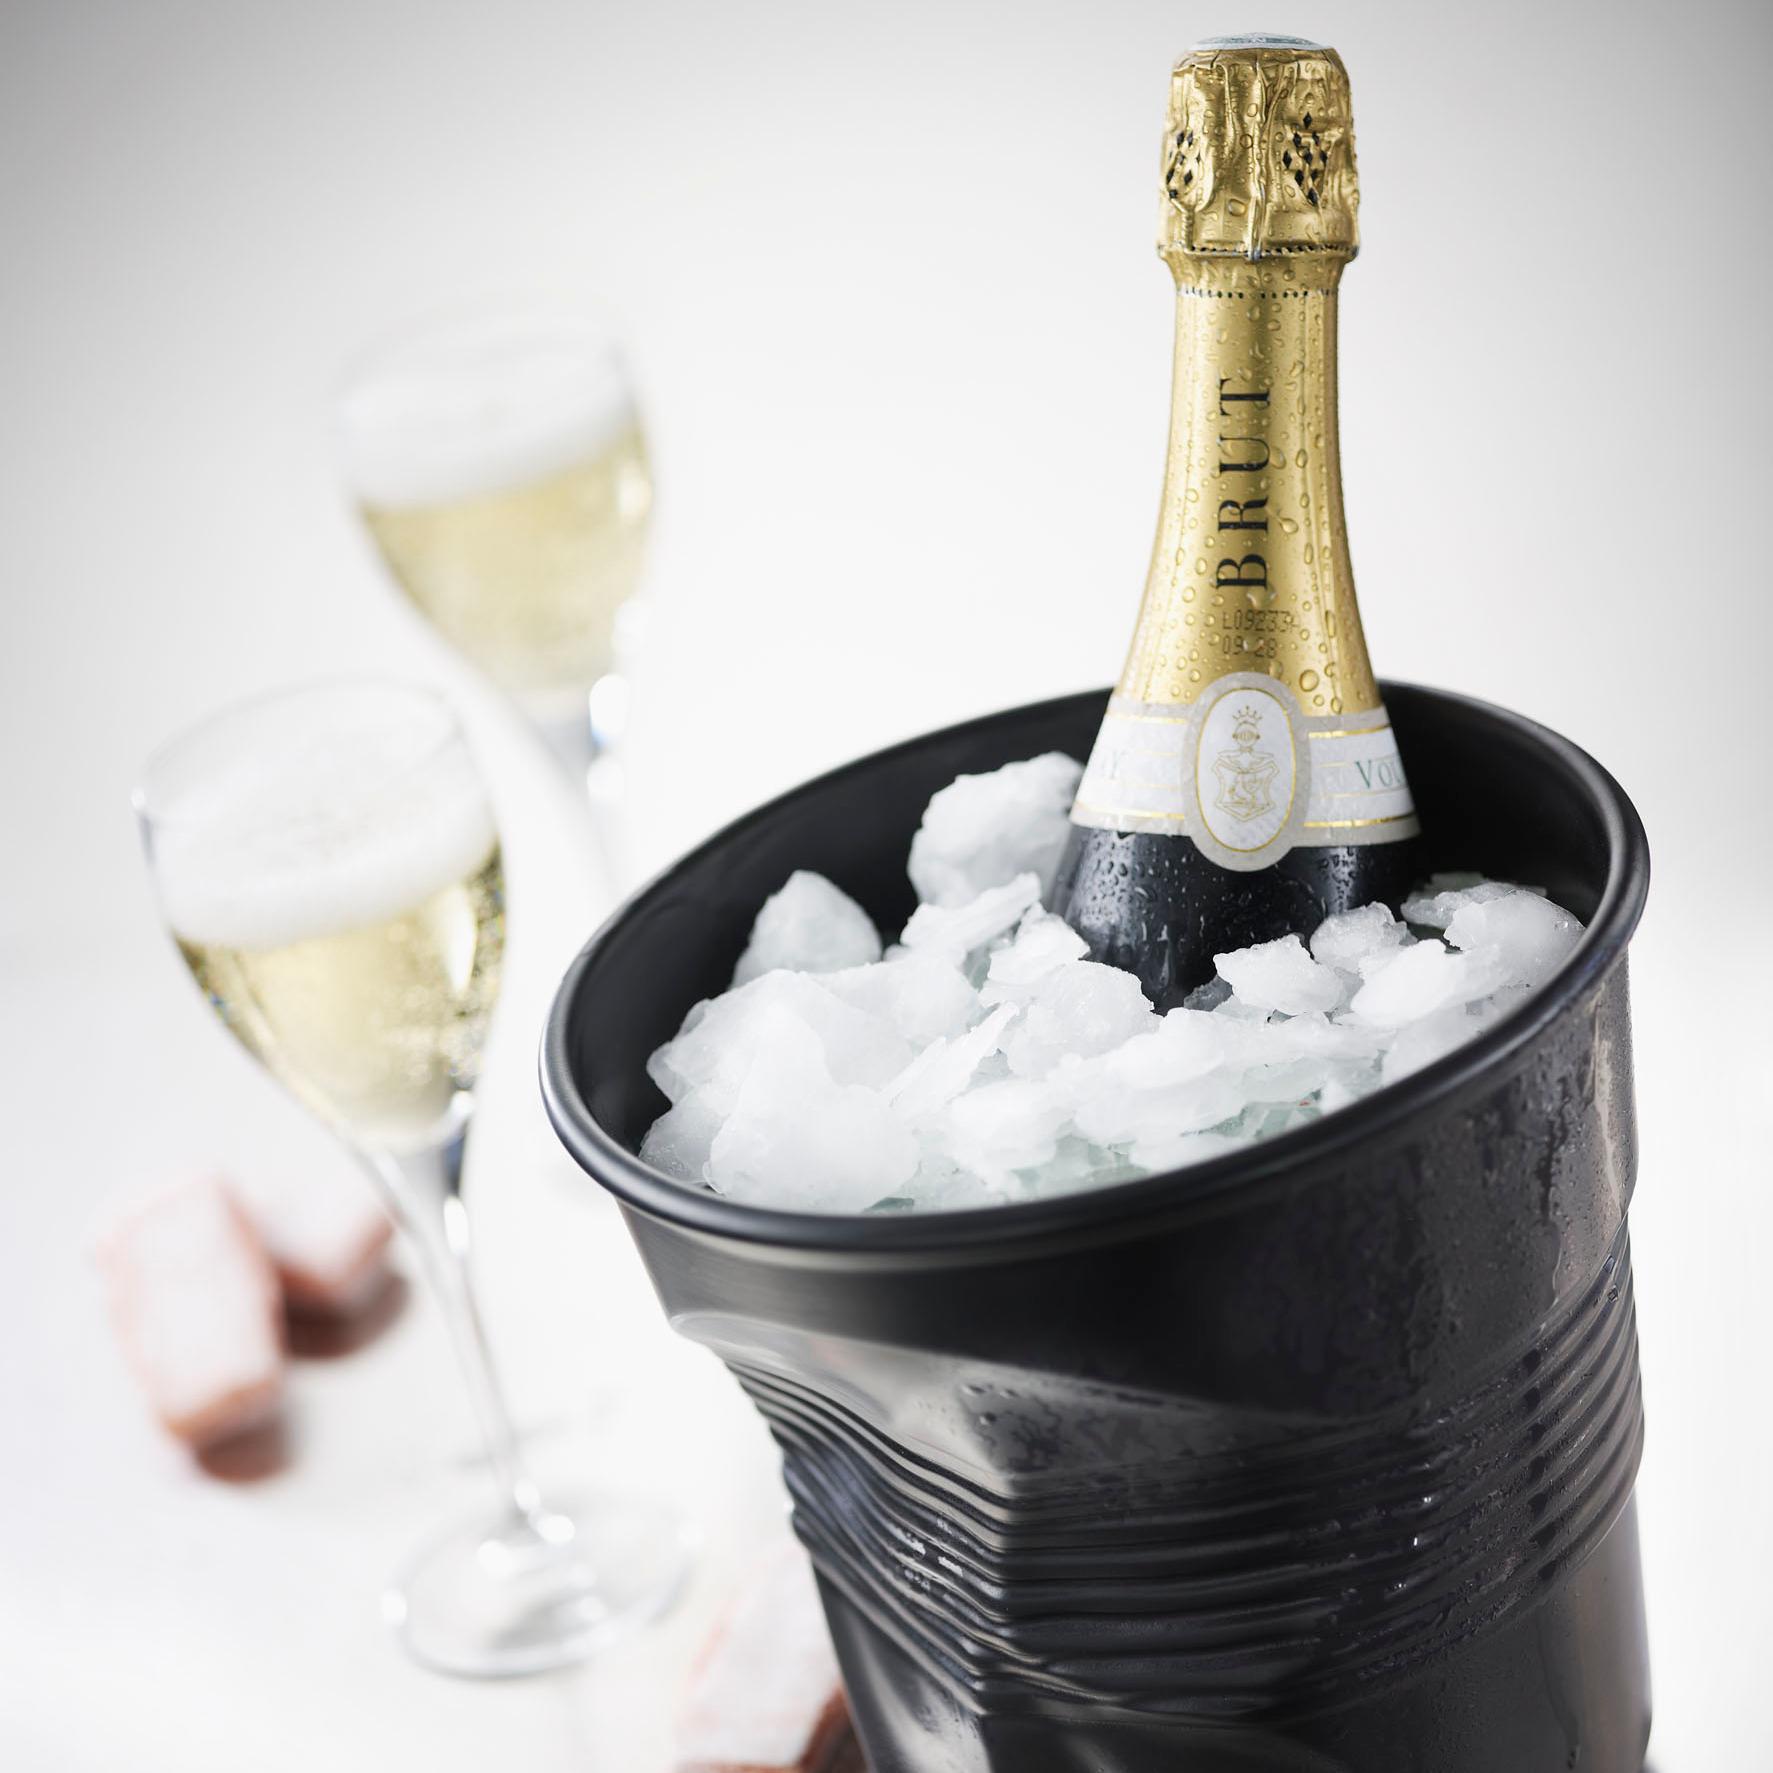 Revol Froisses Satin Black Porcelain Crumple Champagne Bucket